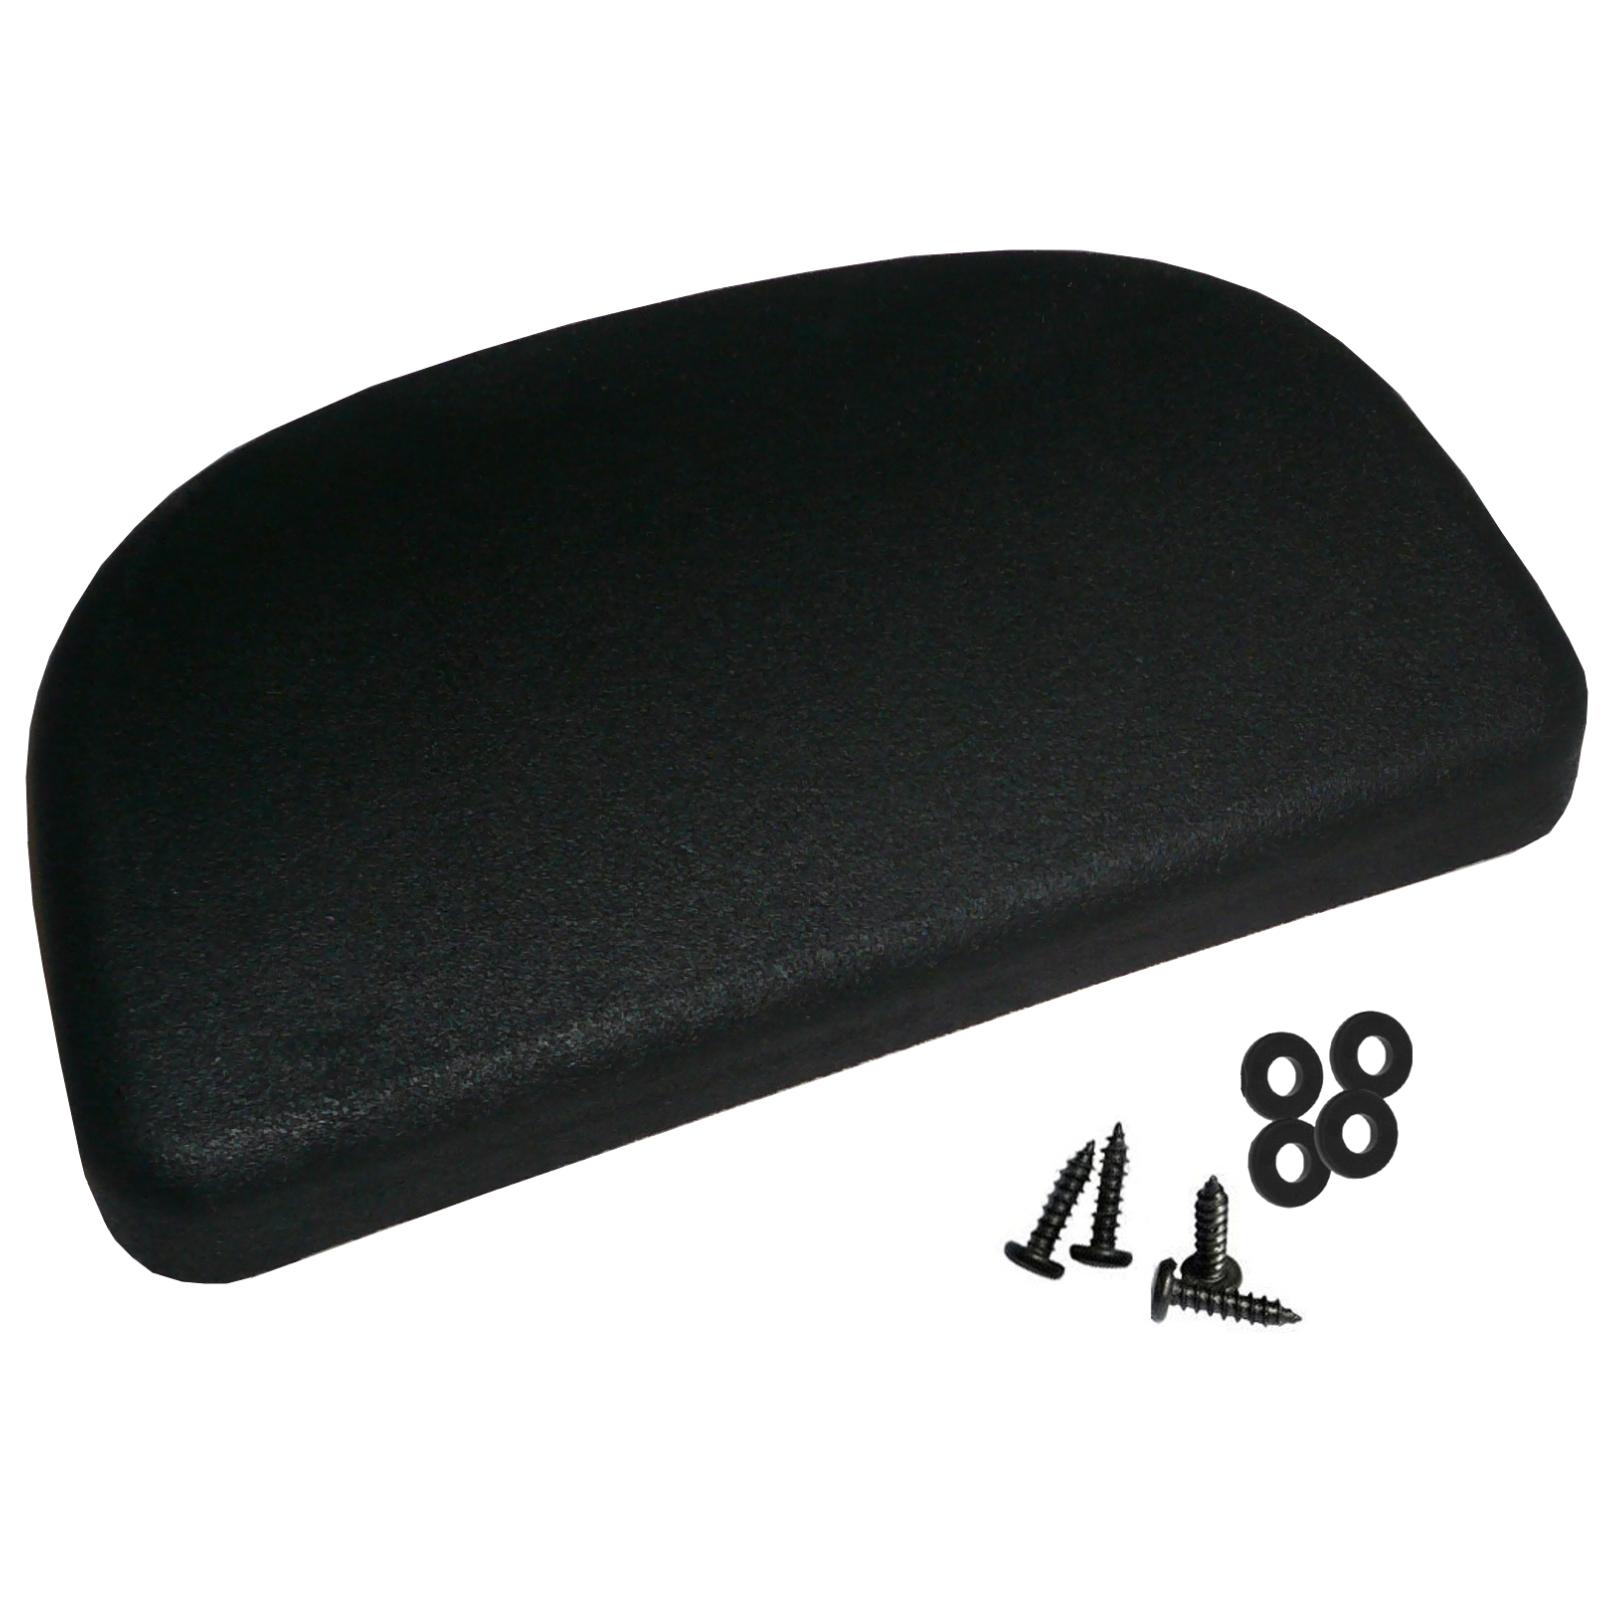 r ckenlehne f r top case box motorrad und roller koffer. Black Bedroom Furniture Sets. Home Design Ideas